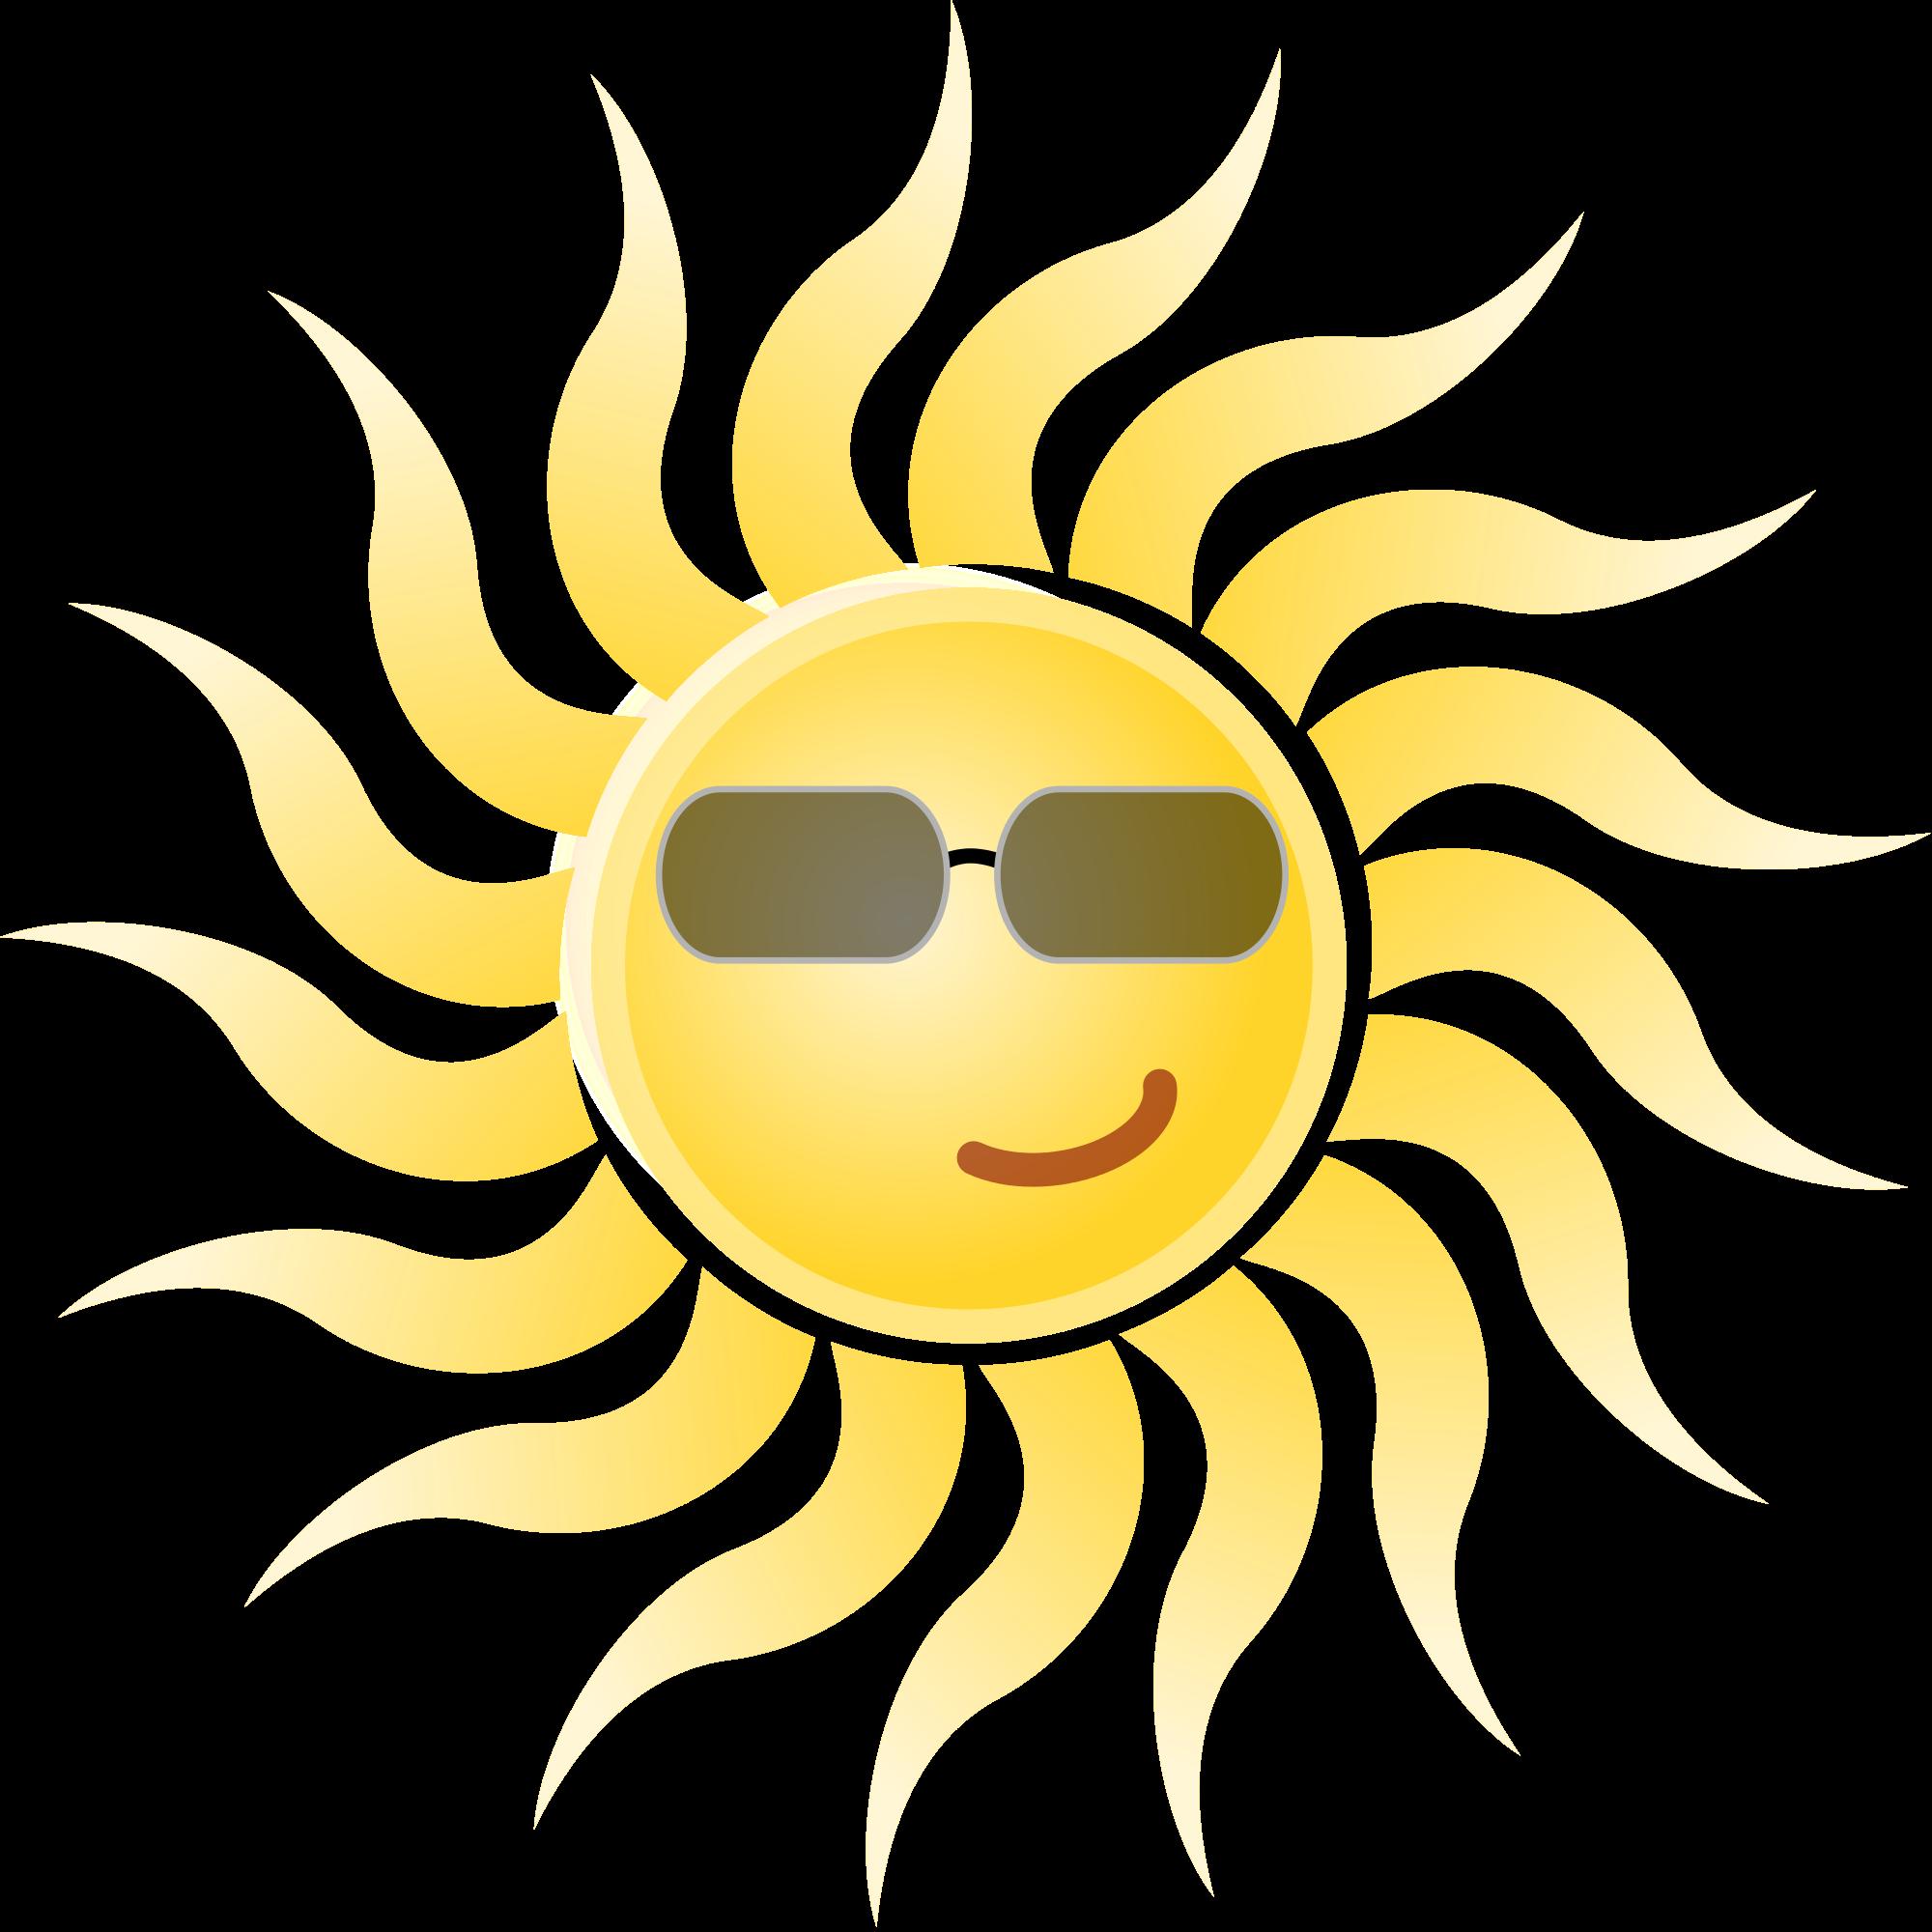 2000x2000 Filesun Wearing Sunglasses.svg